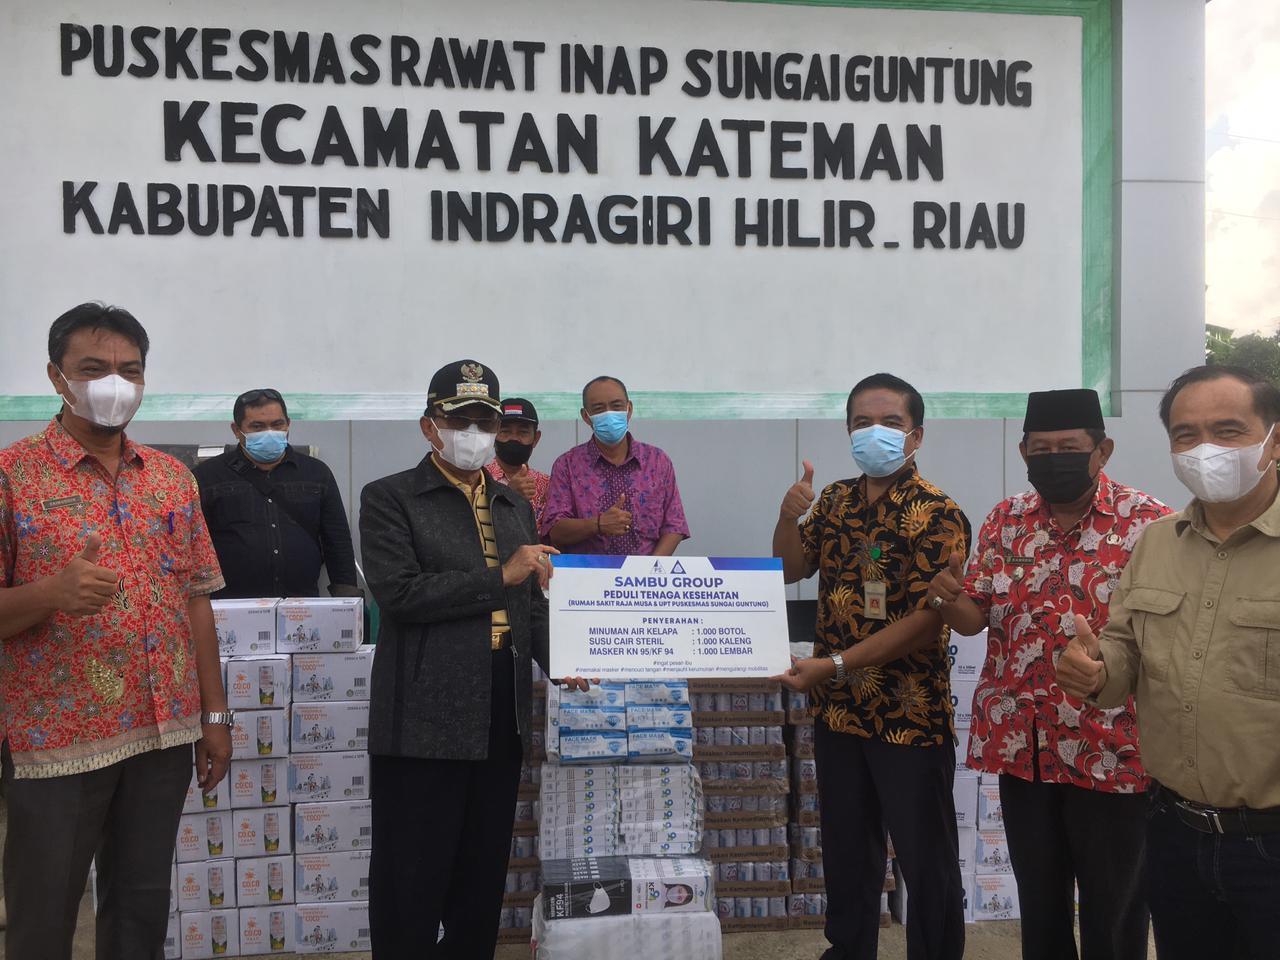 Sambu Group Sumbang 1000 Botol Minuman Air Kelapa, 1000 Kaleng Susu Cair dn 1000 Masker Untuk Nakes